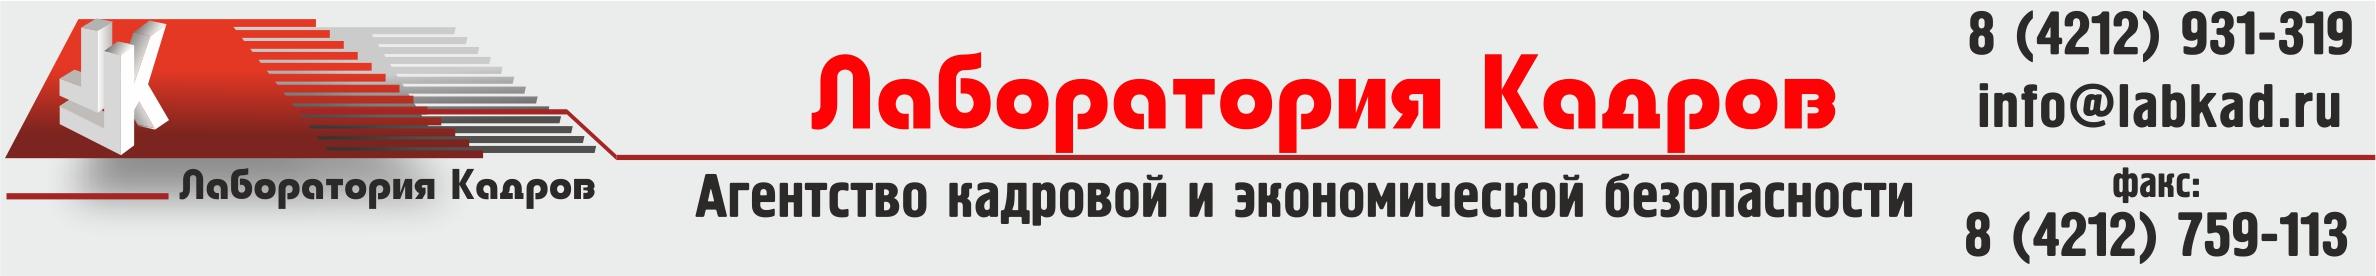 Лаборатория Кадров